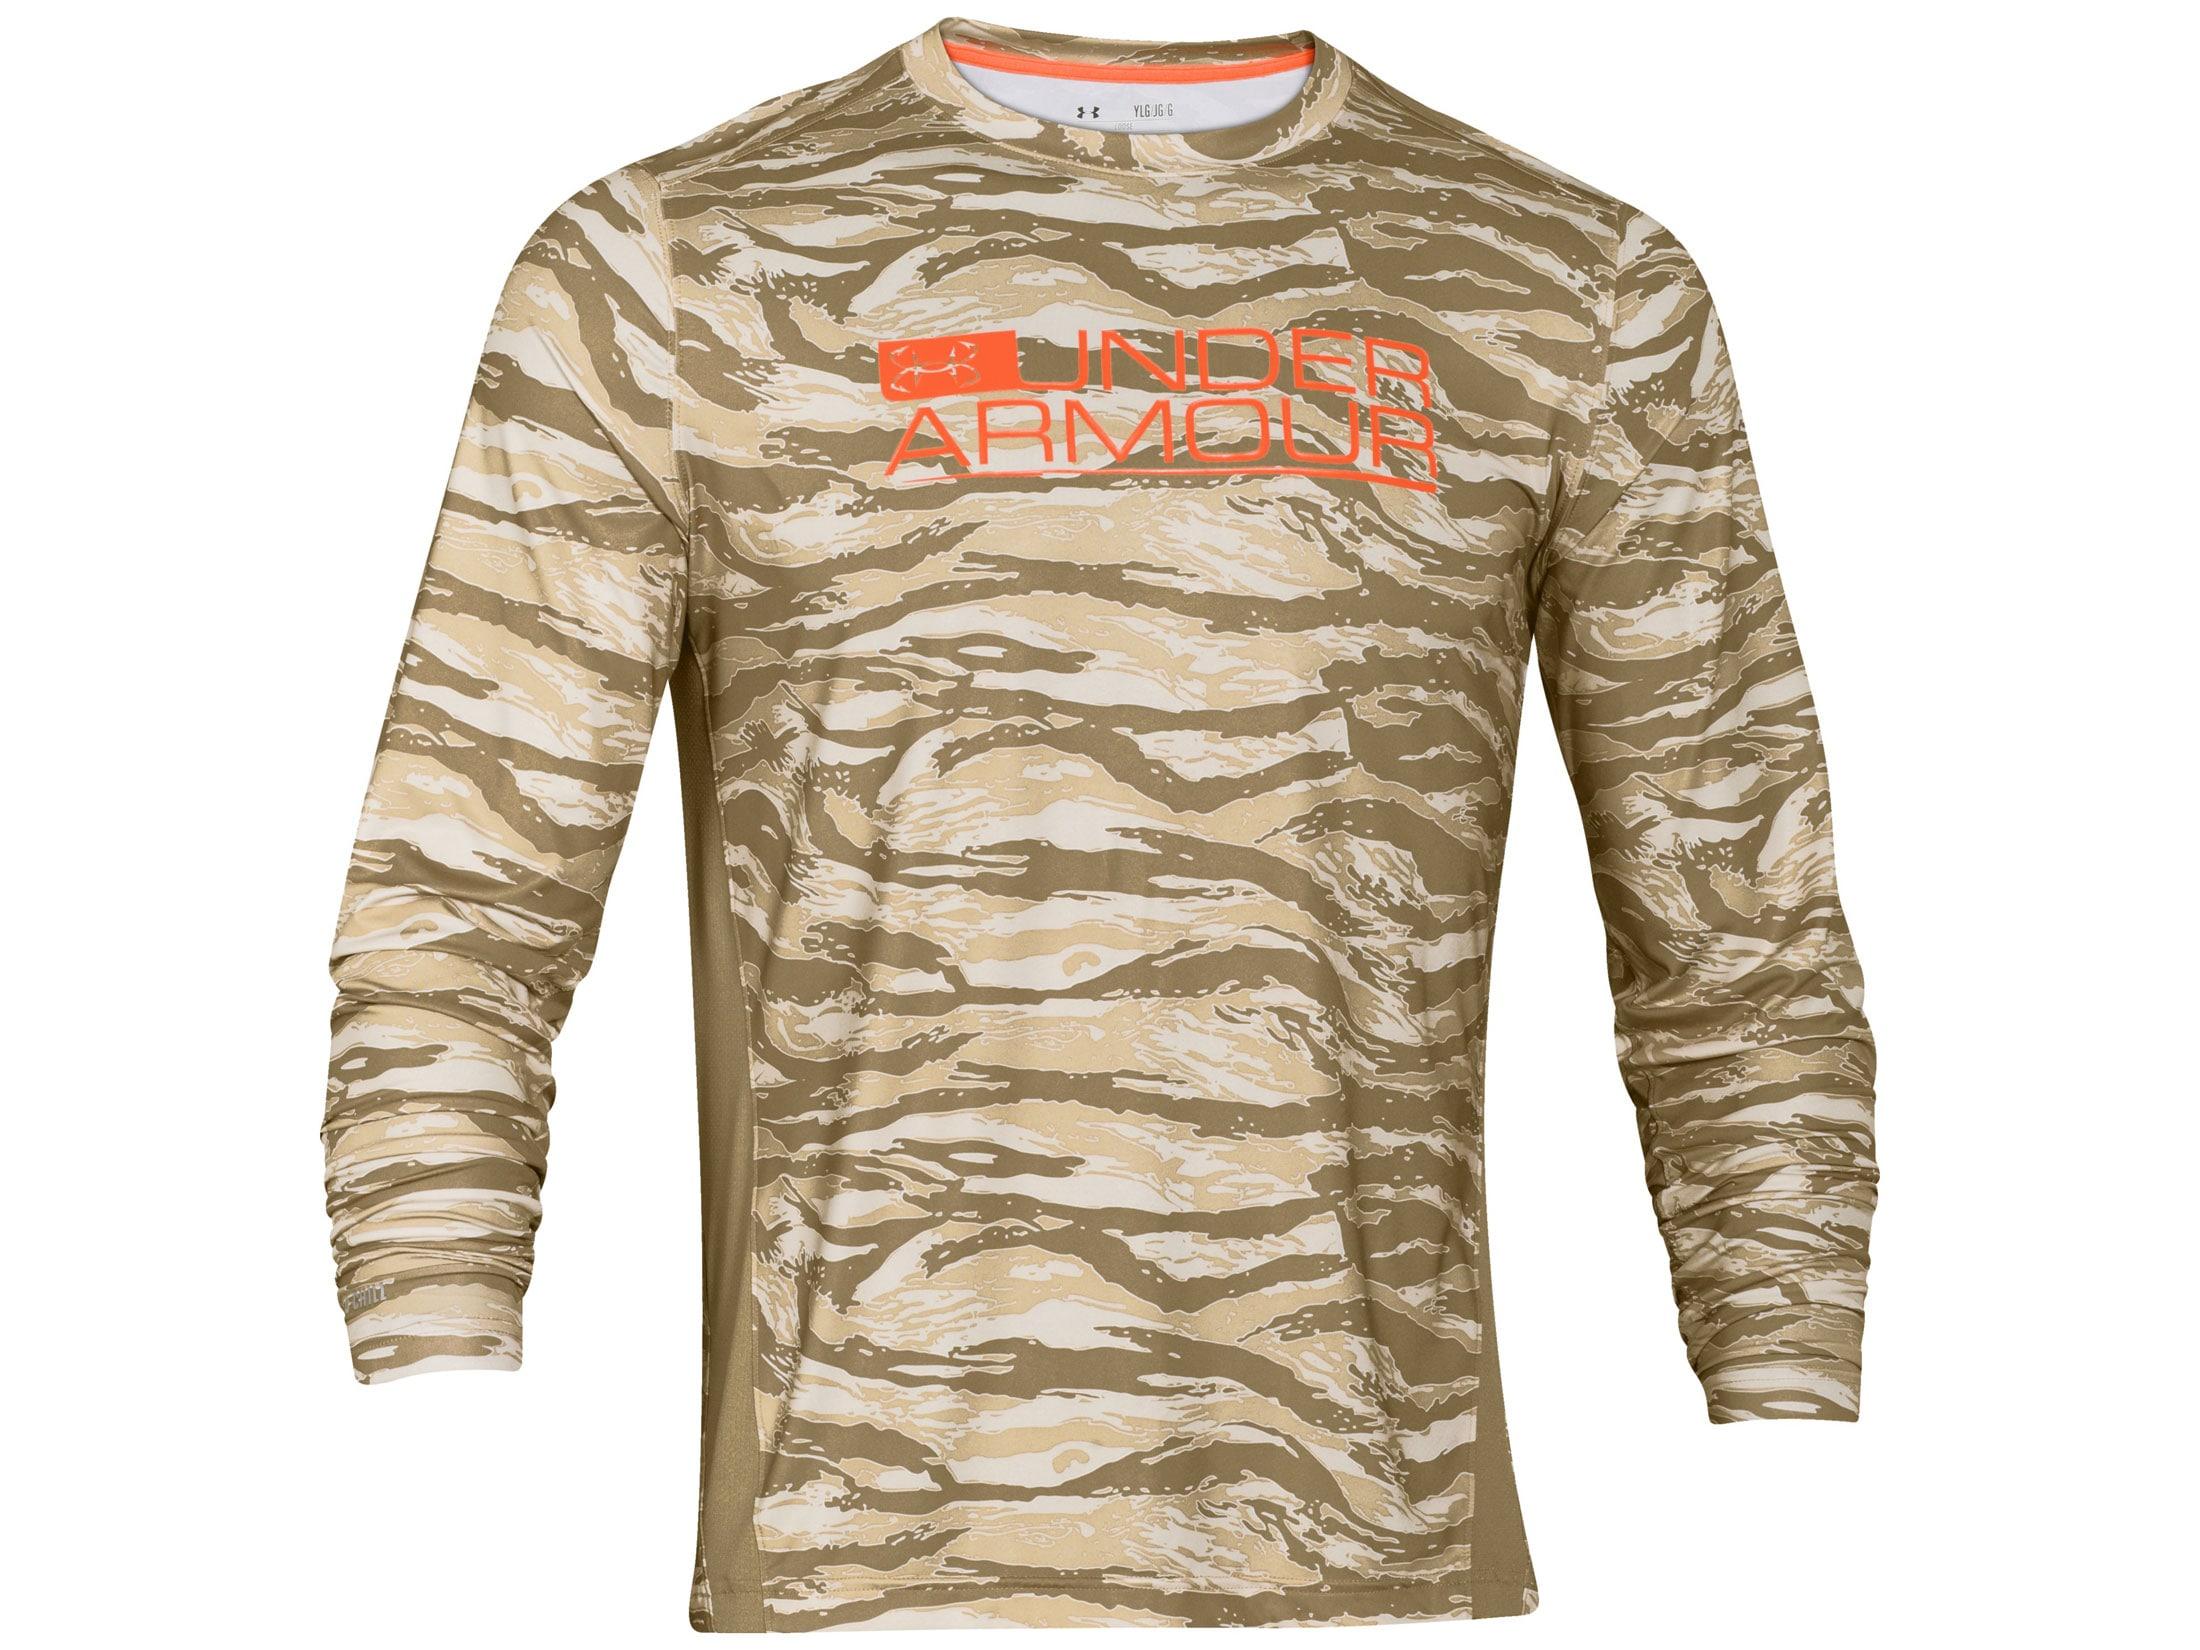 07ec6bcb46 Under Armour Men's ISO-Chill Element Vented Long Sleeve Shirt Nylon